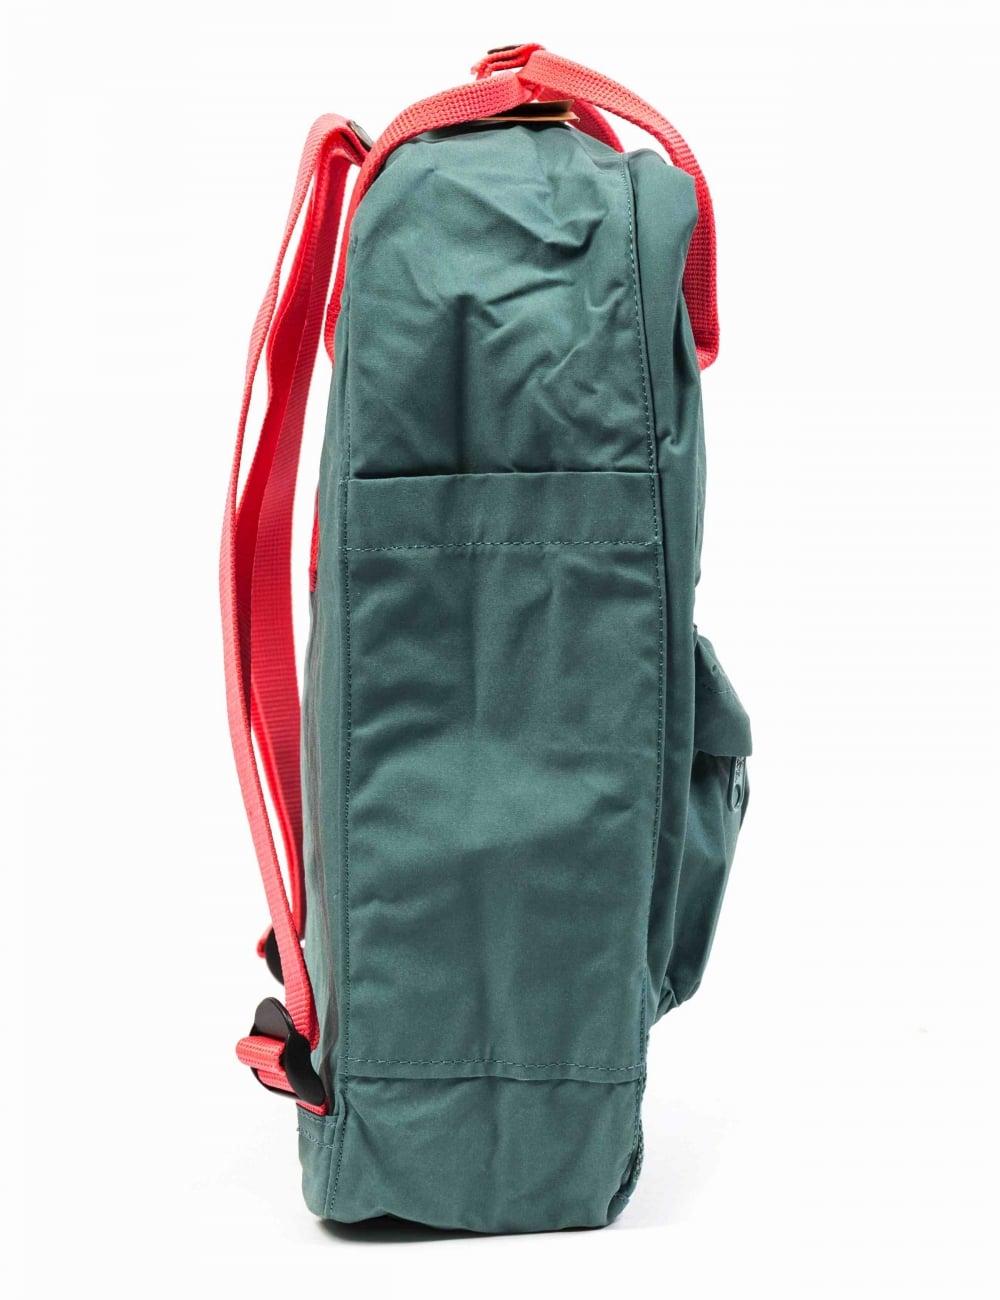 kanken backpack frost green